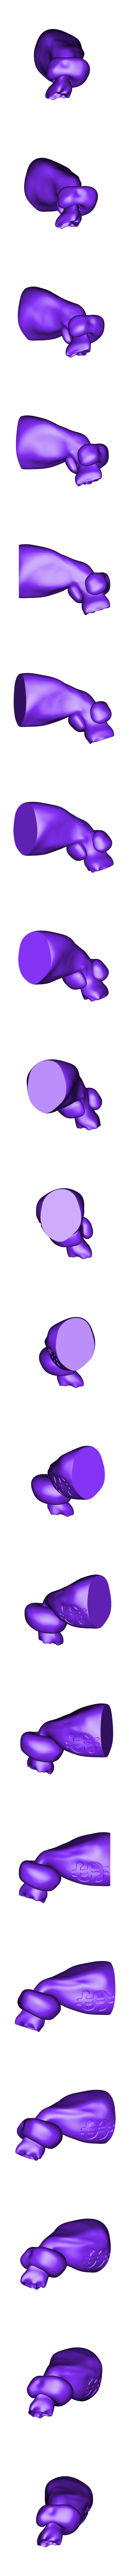 M.Krabs - Pince Gauche.stl Download free STL file Mr. Krabs • 3D printable design, BODY3D